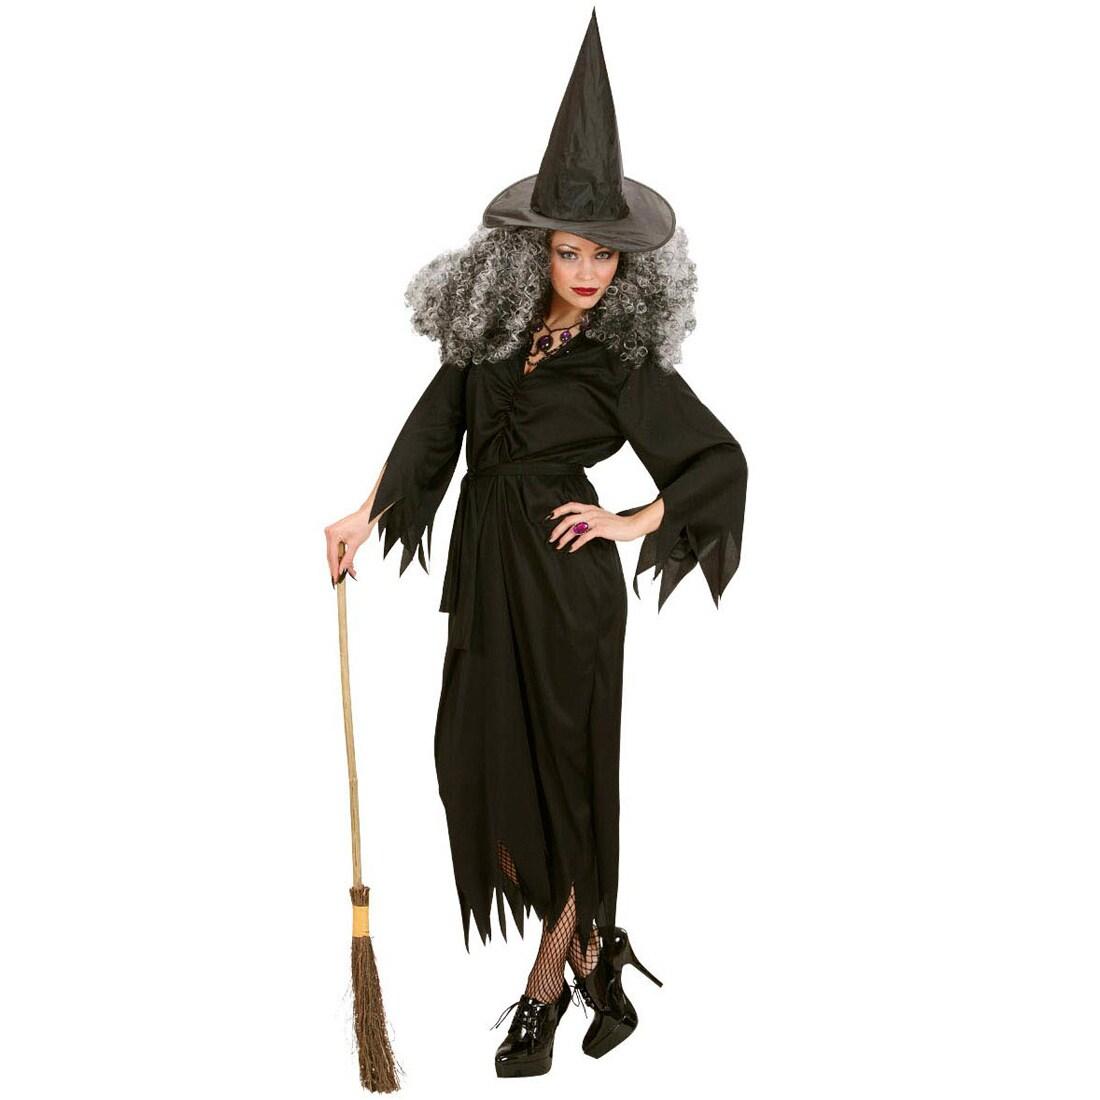 Kraushaar Hexenperücke Hexen Perücke Hexe Halloween Damen Vampirperücke schwarz